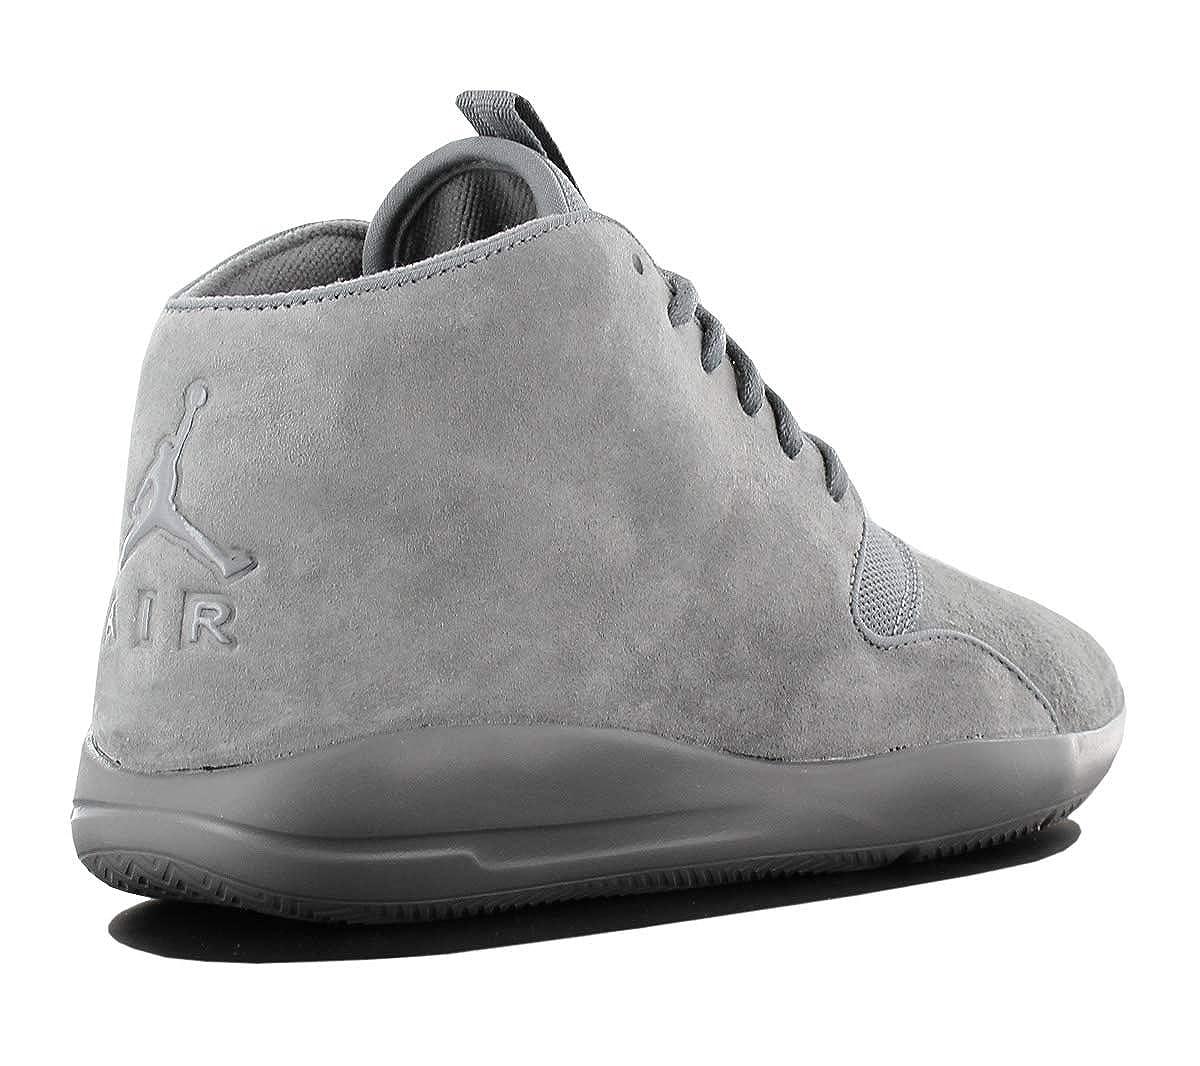 88ff10383a Nike Jordan Eclipse Chukka Lea, Scarpe da Basket Uomo: Amazon.it: Scarpe e  borse